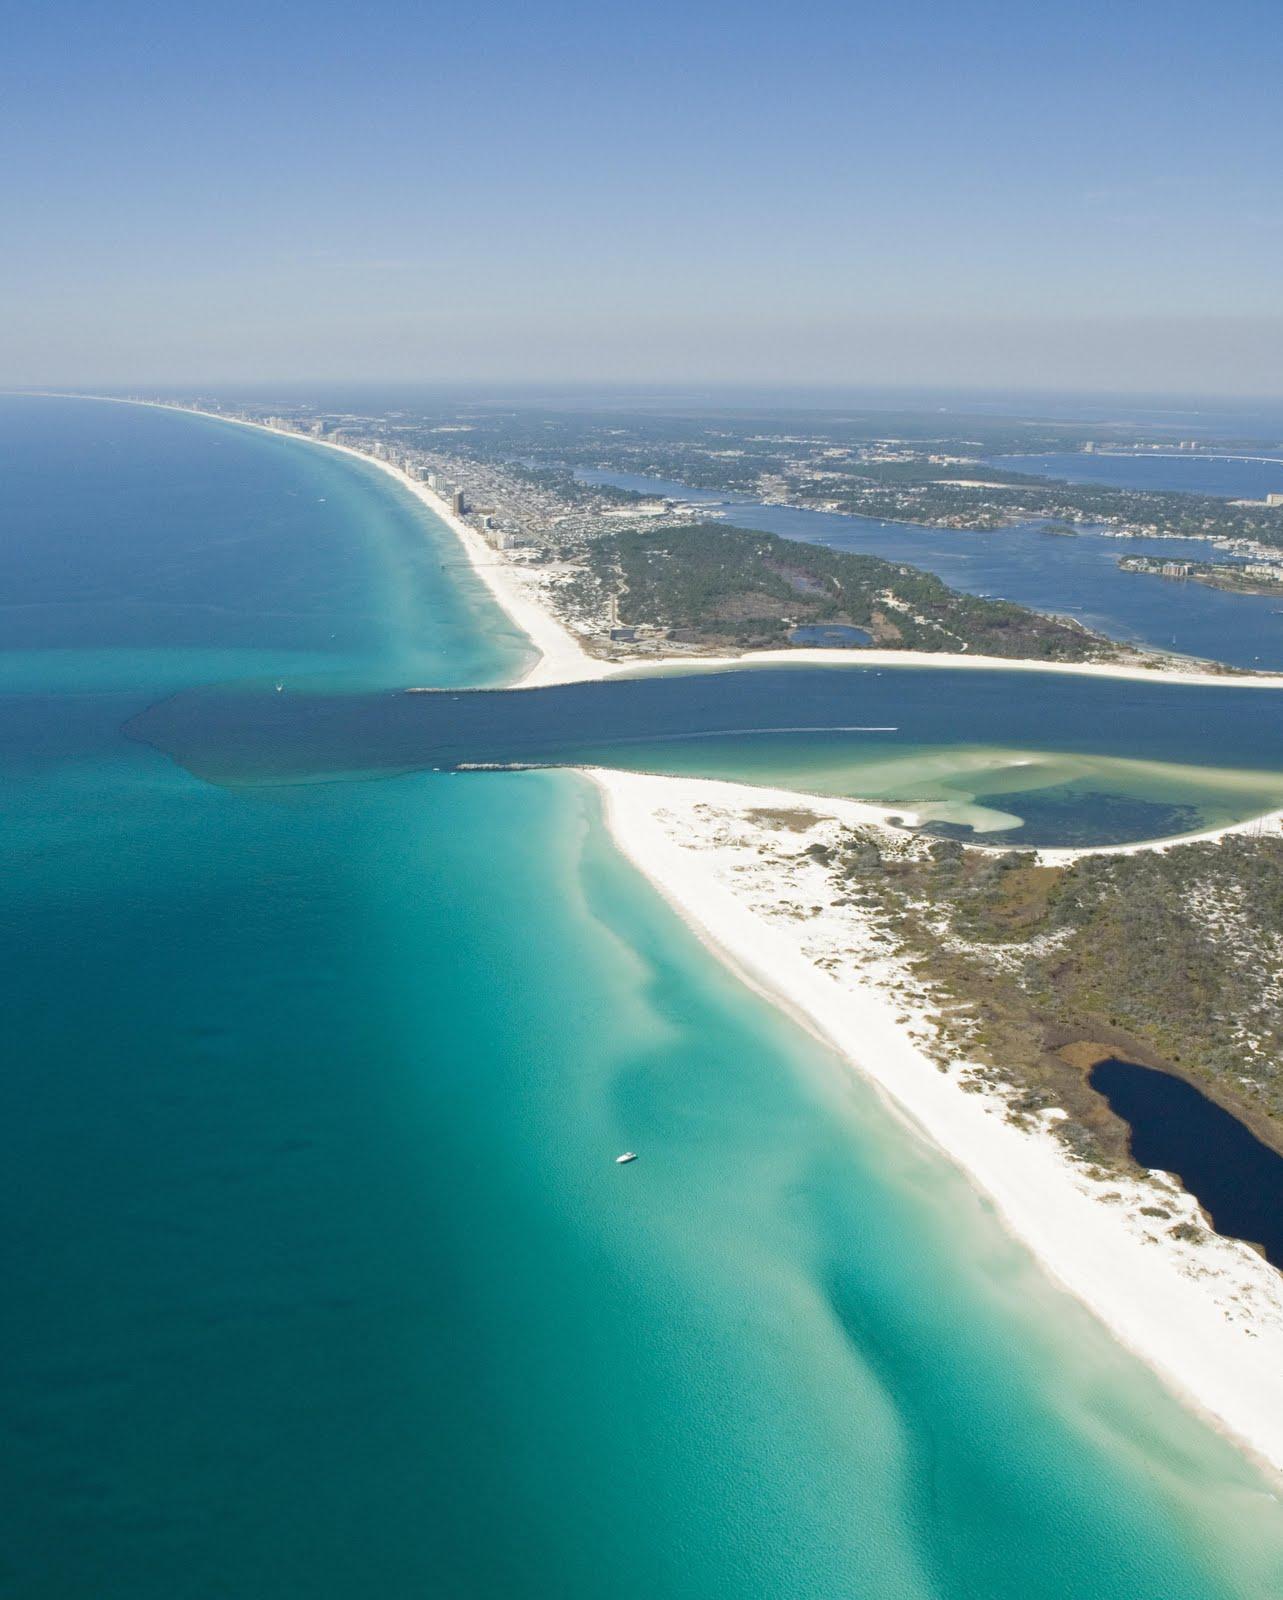 Gulf Of Mexico Vacation Spots In Texas: 0wnyard: Beach Of Panama